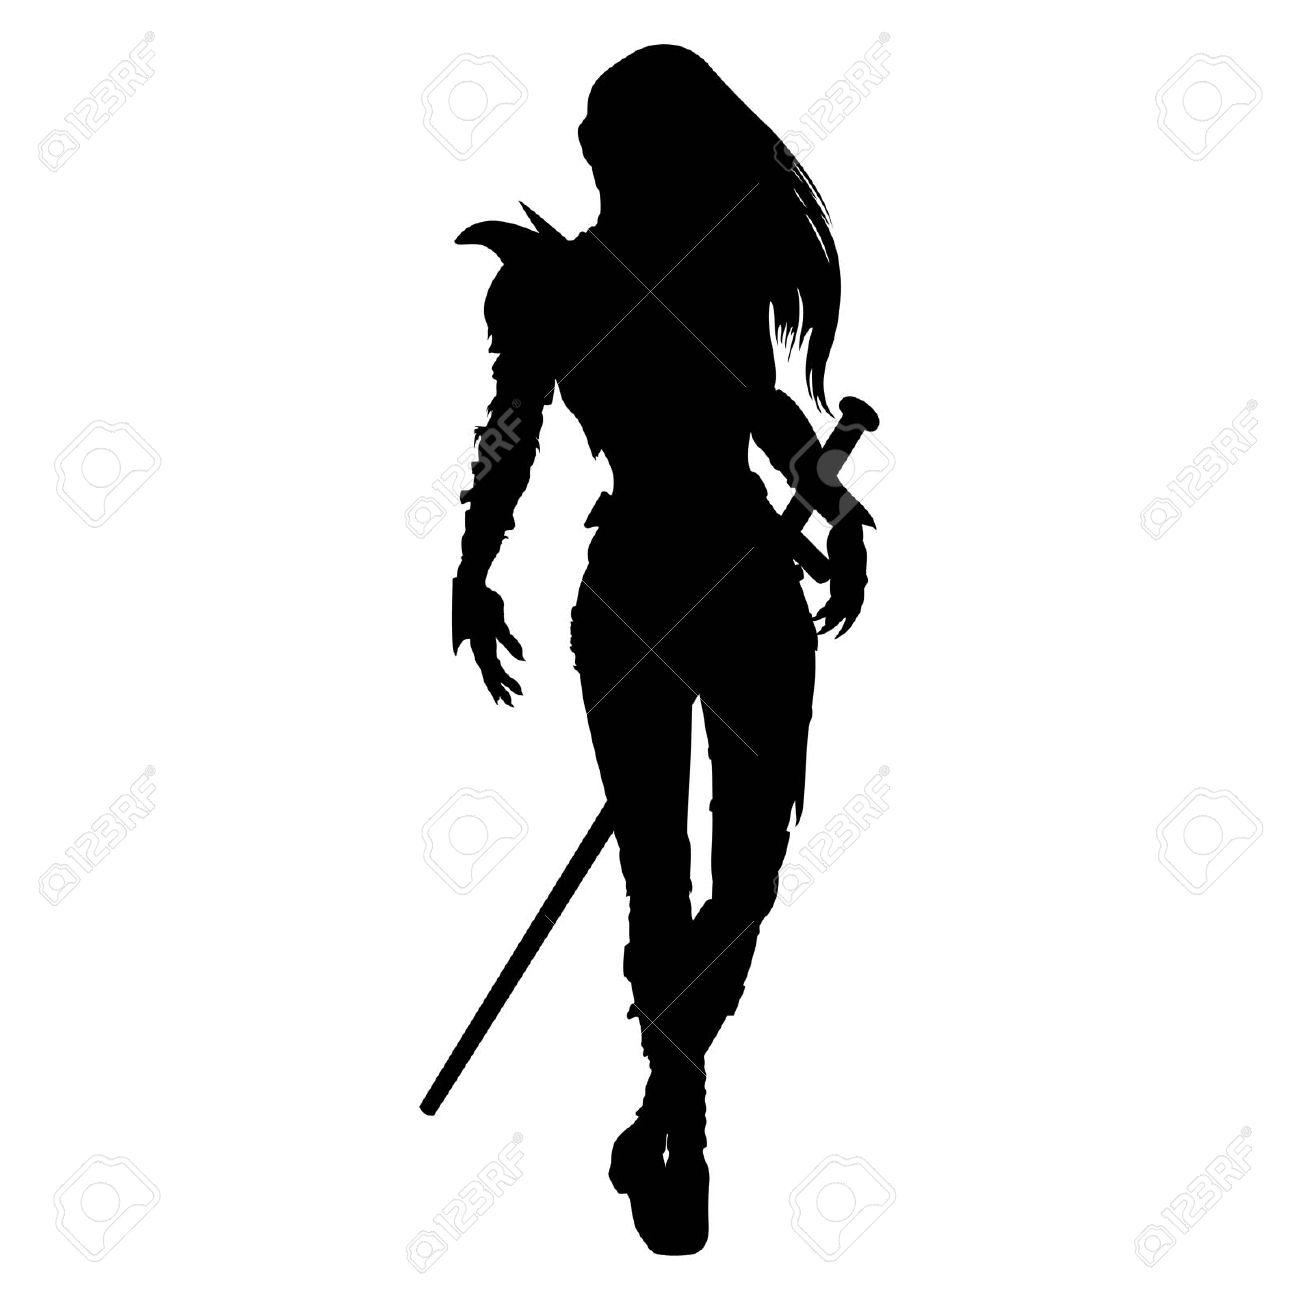 Women Warrior clipart #13, Download drawings